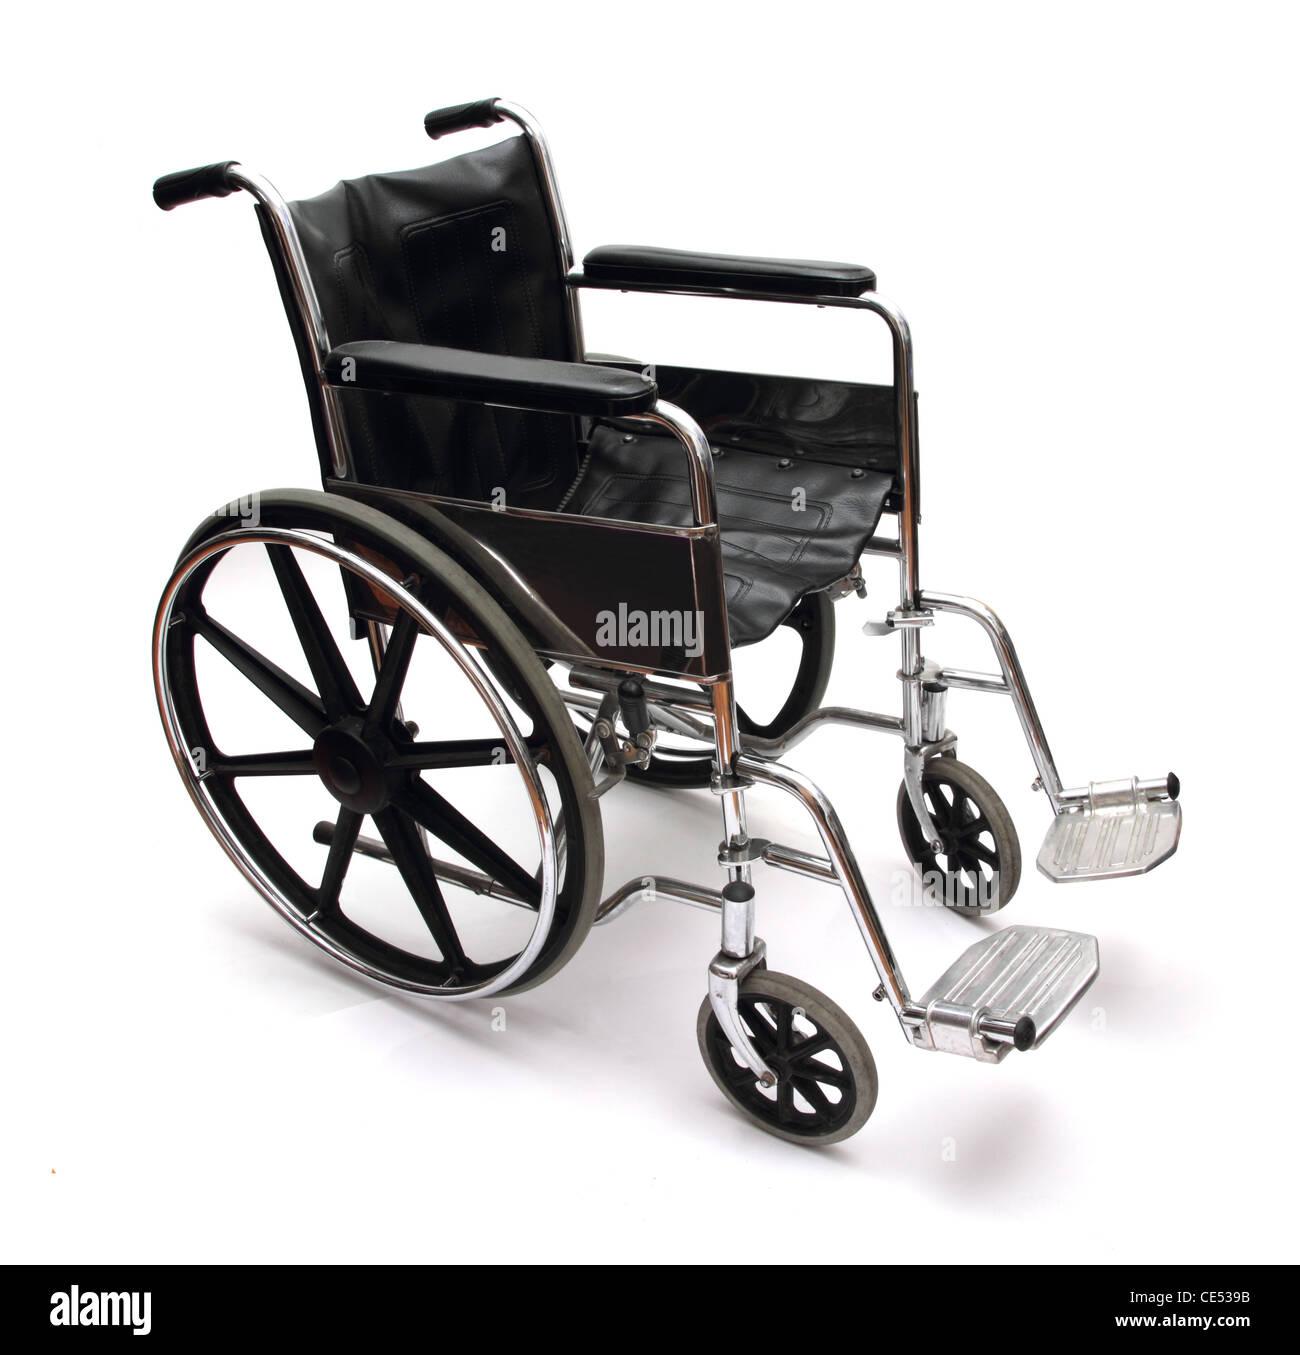 wheel chair - Stock Image